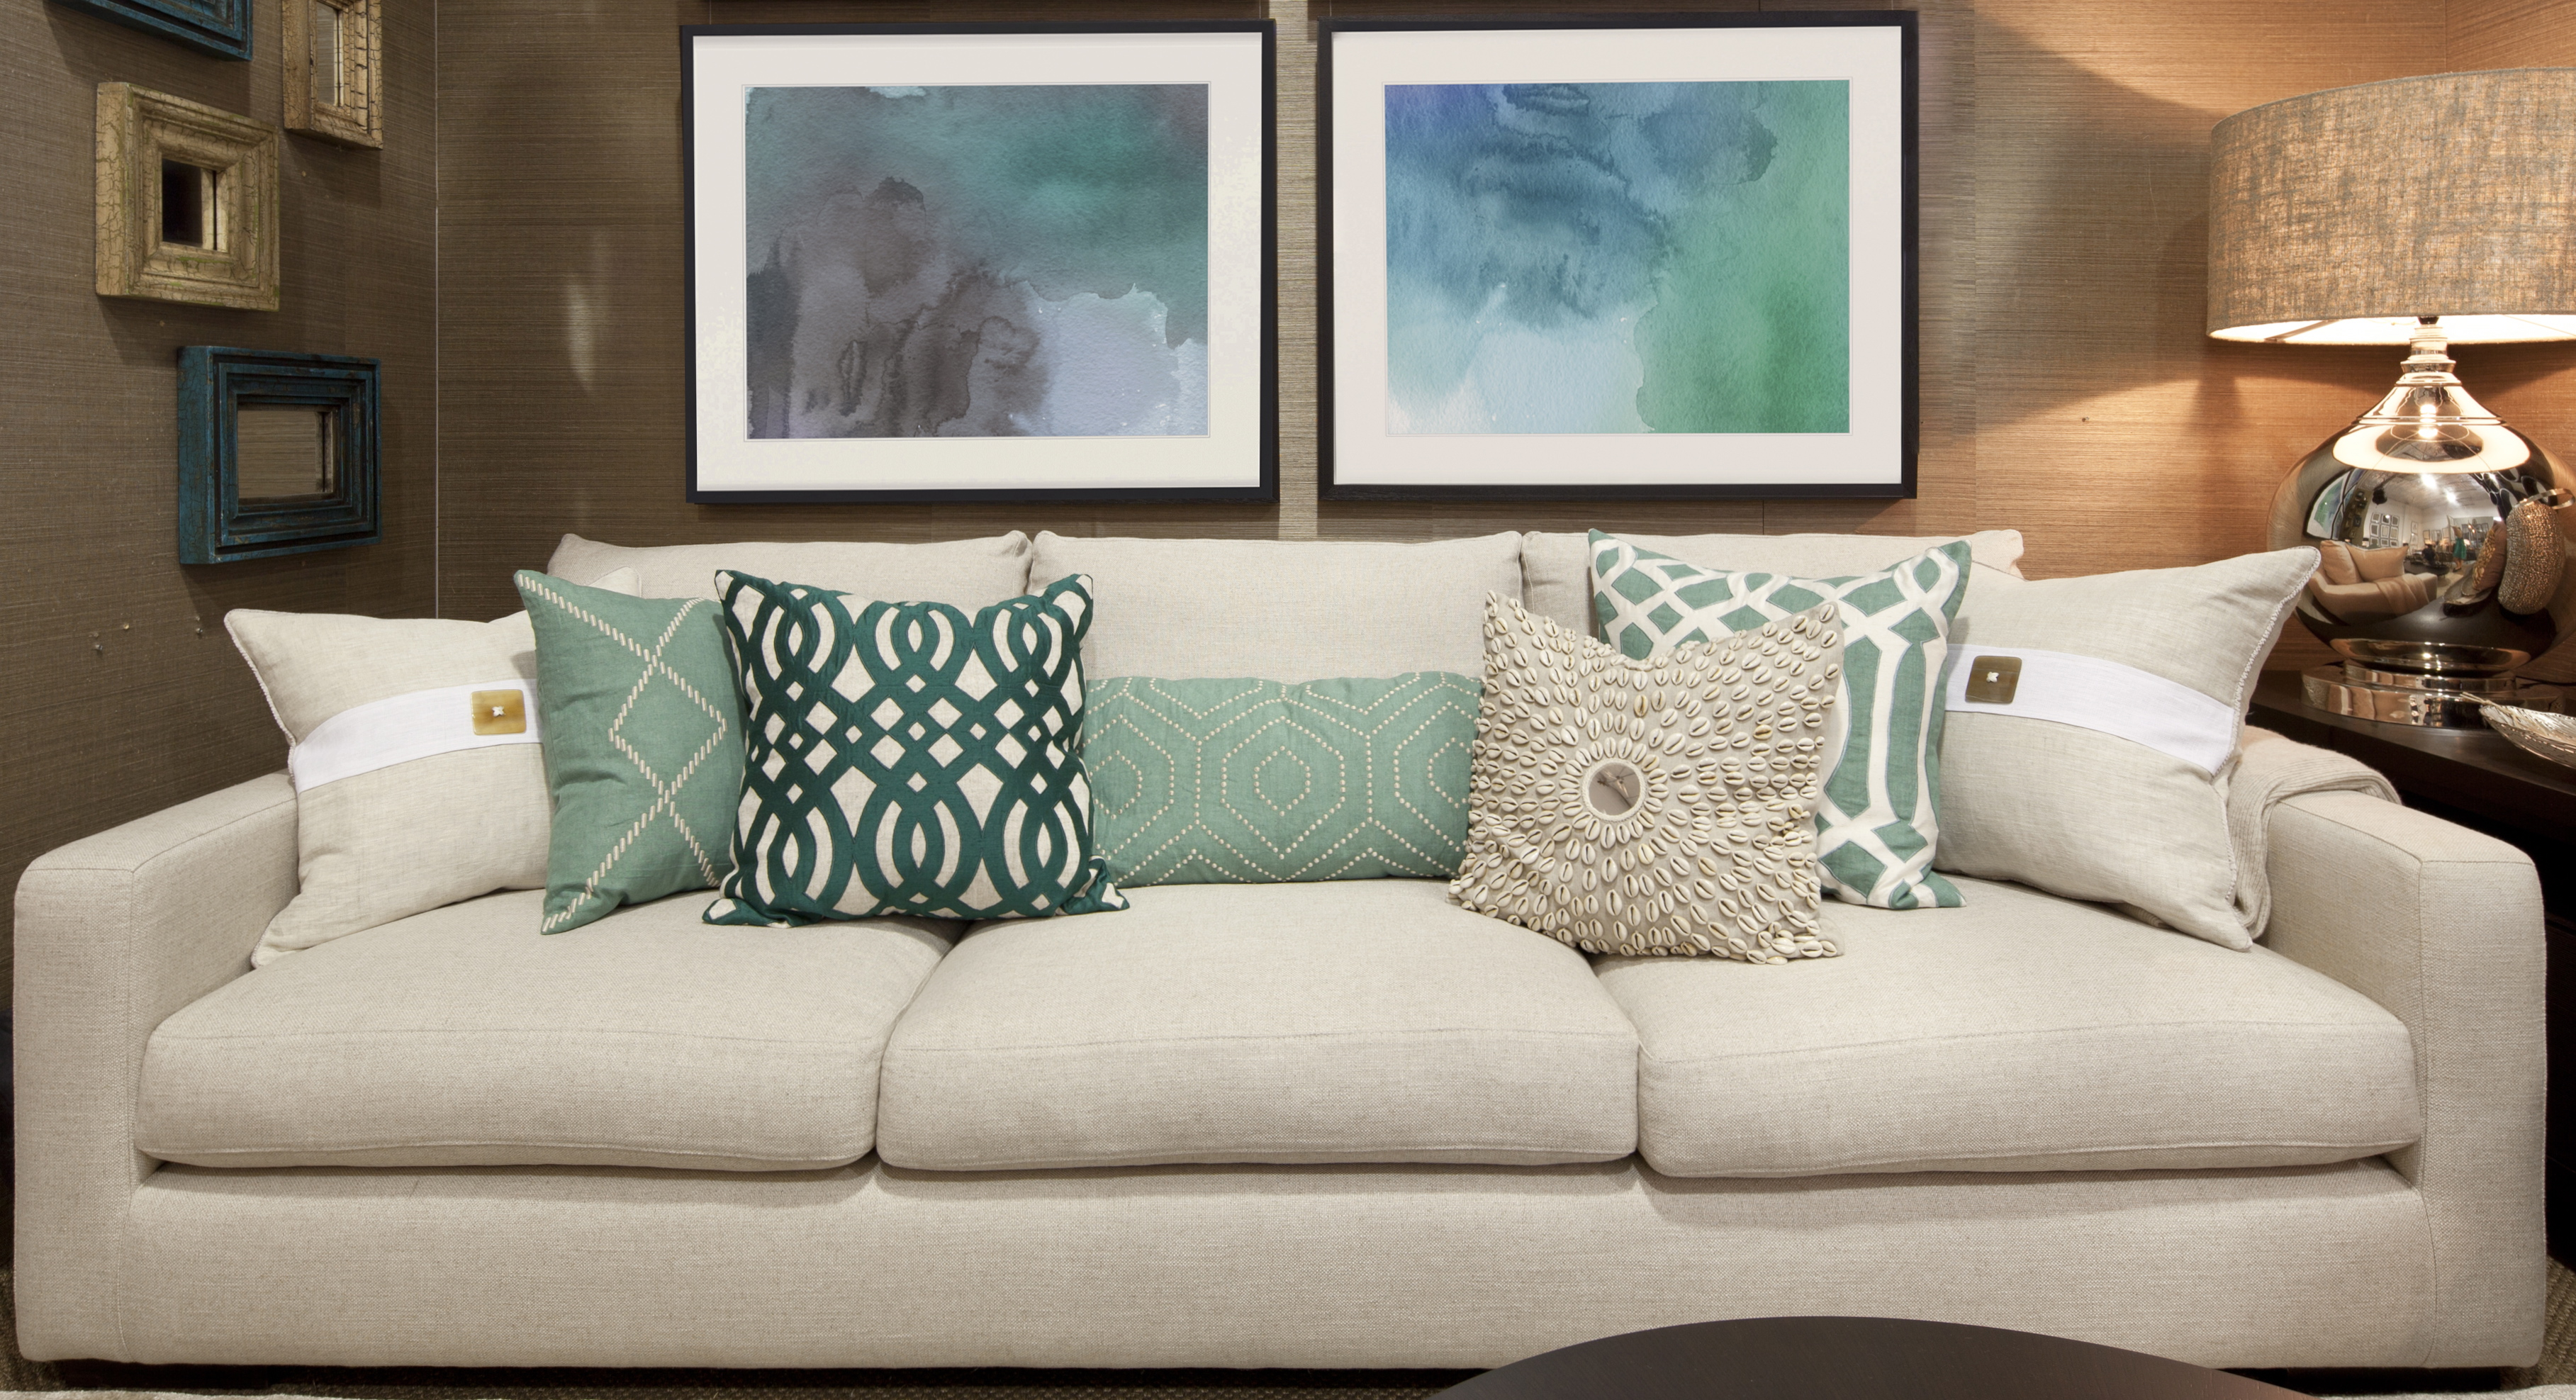 Coastal Decor - Cushions, Couch, Lamp and Art